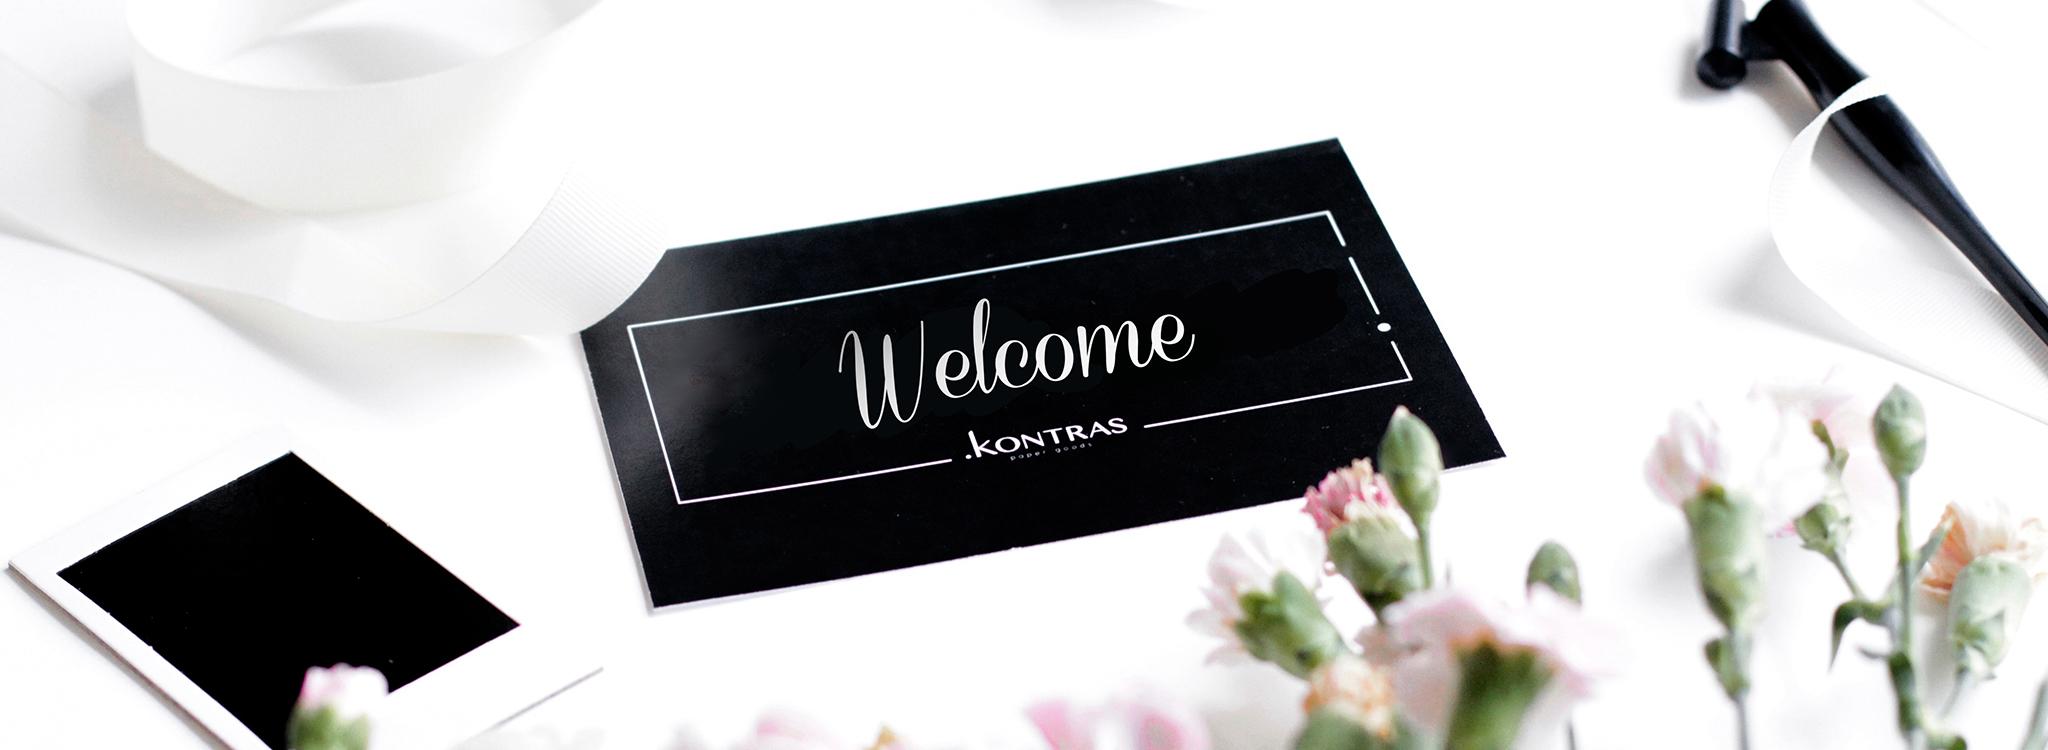 Welcome to Kontras.jpg